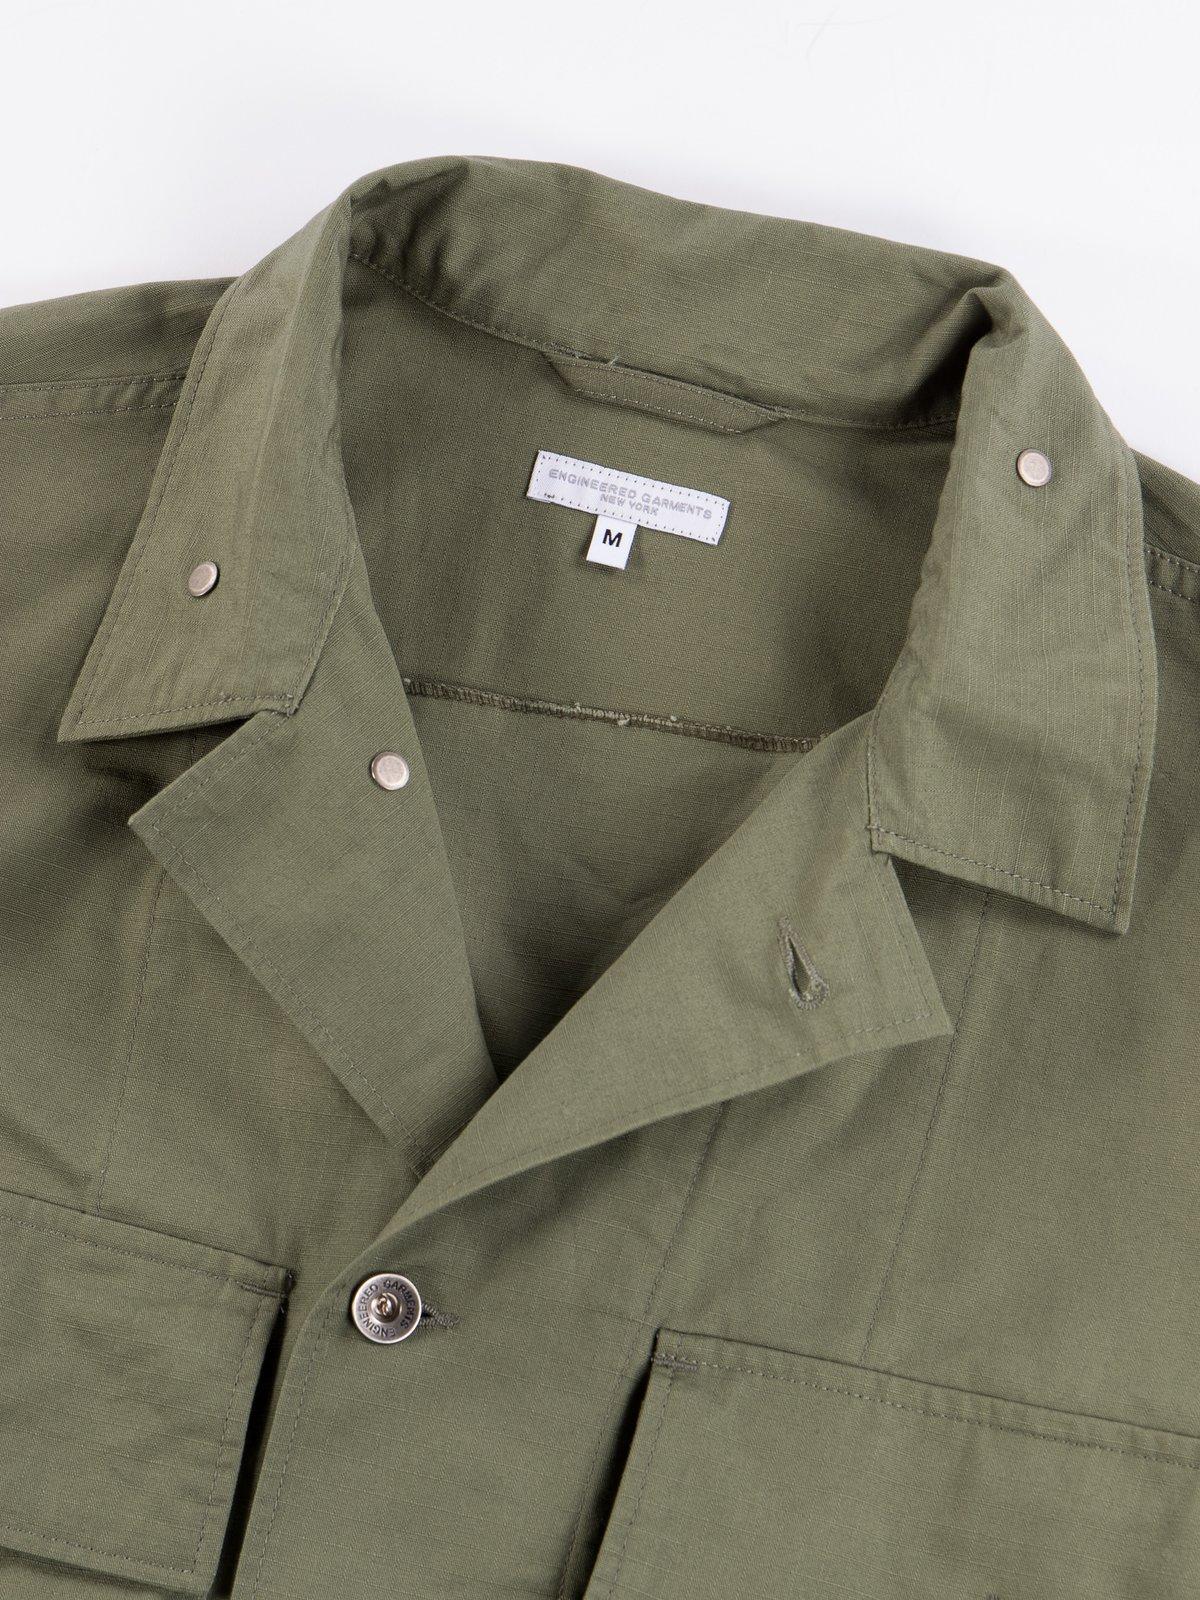 Olive Cotton Ripstop M43/2 Shirt Jacket - Image 7